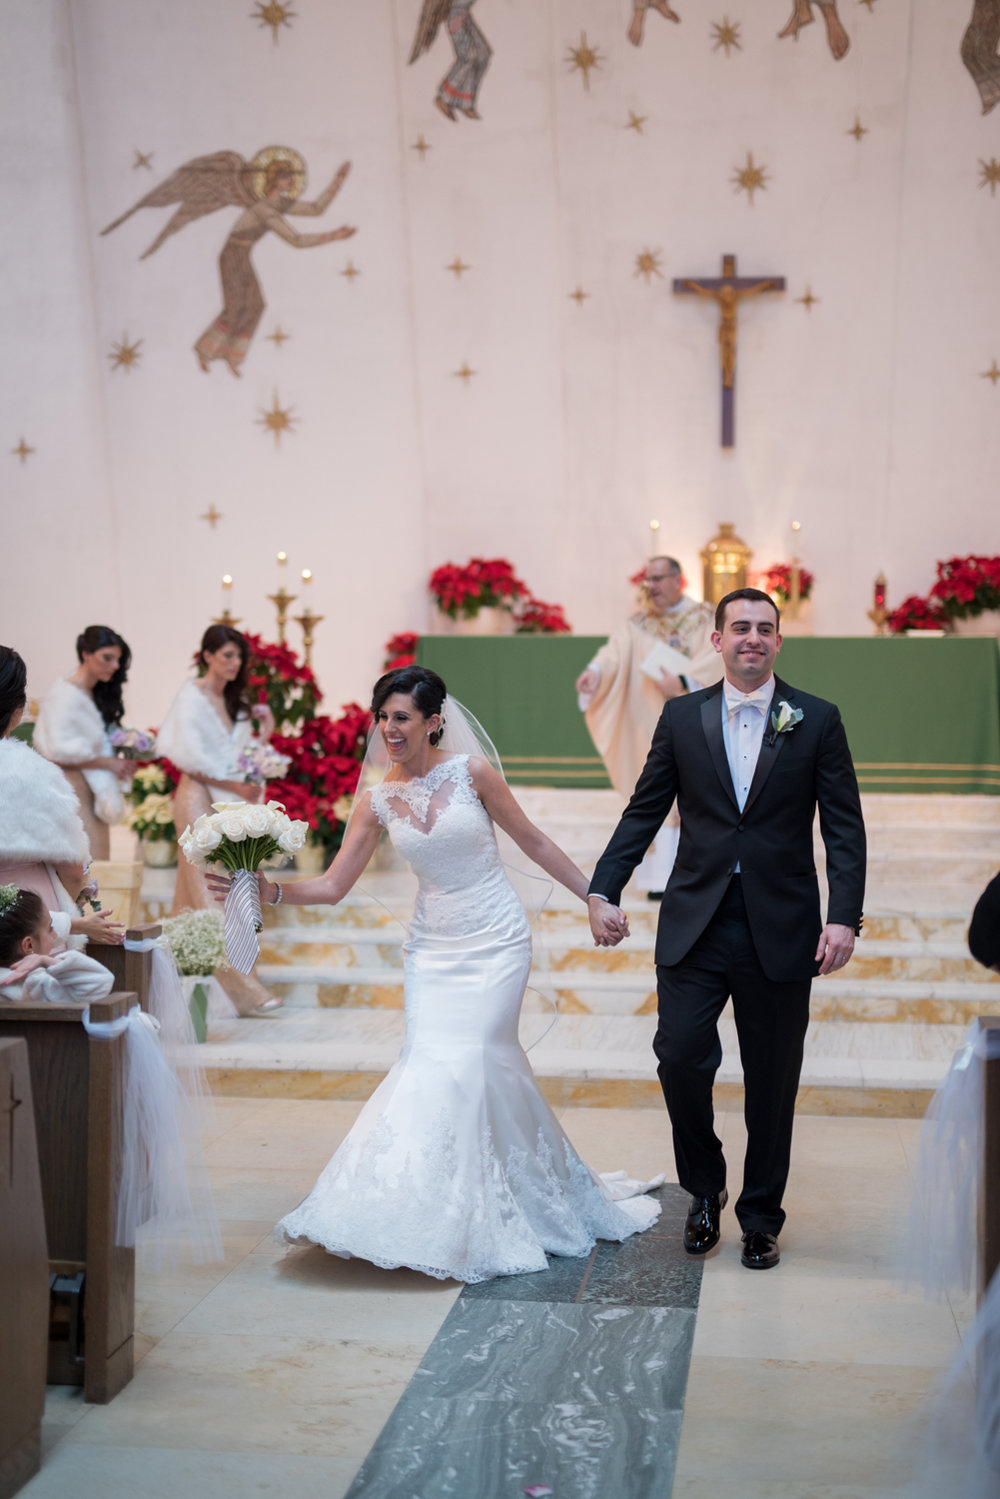 Michelle+Joe- Ryland Inn Wedding- New Jersey-Olivia Christina Photo - BLOG-182.JPG